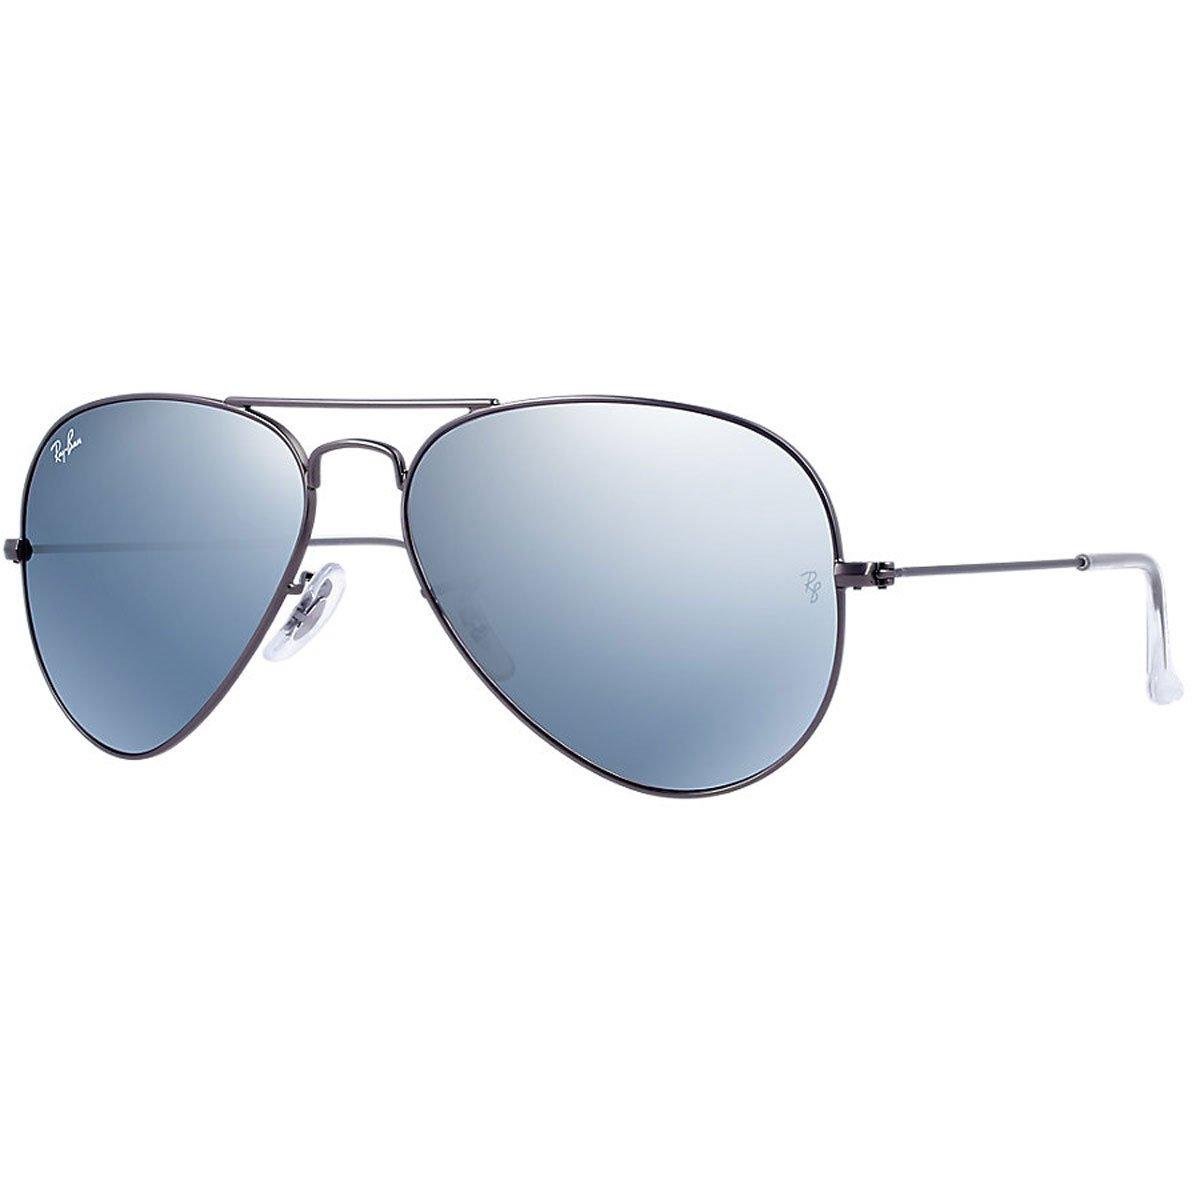 Ray-Ban 3025 Aviator Large Metal Mirrored Non-Polarized Sunglasses, Gunmetal/Silver Flash (029/30), 58 mm by Ray-Ban (Image #1)